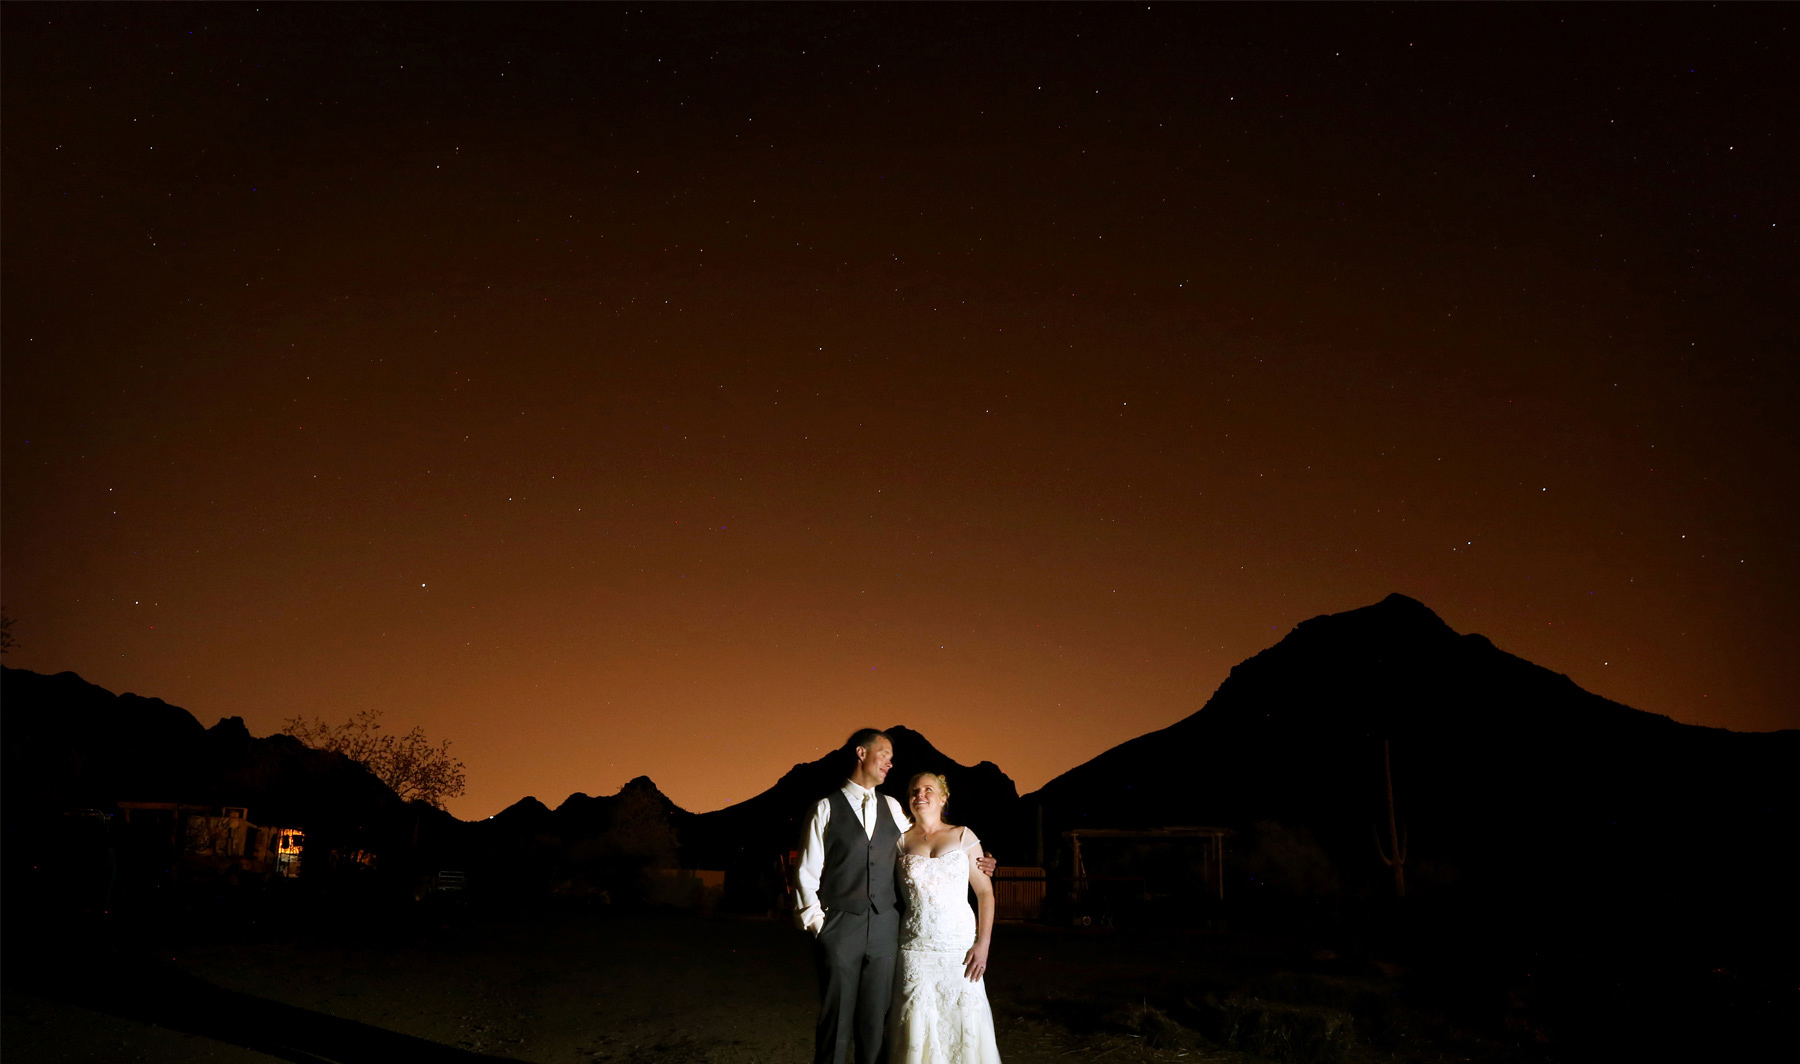 19-Tuscan-Arizona-Wedding-Photography-by-Vick-Photography-Destination-Wedding-Desert-Old-Tucson-Studios-Cactus-Sunset-Night-Photography-Elsa-and-Arthur.jpg